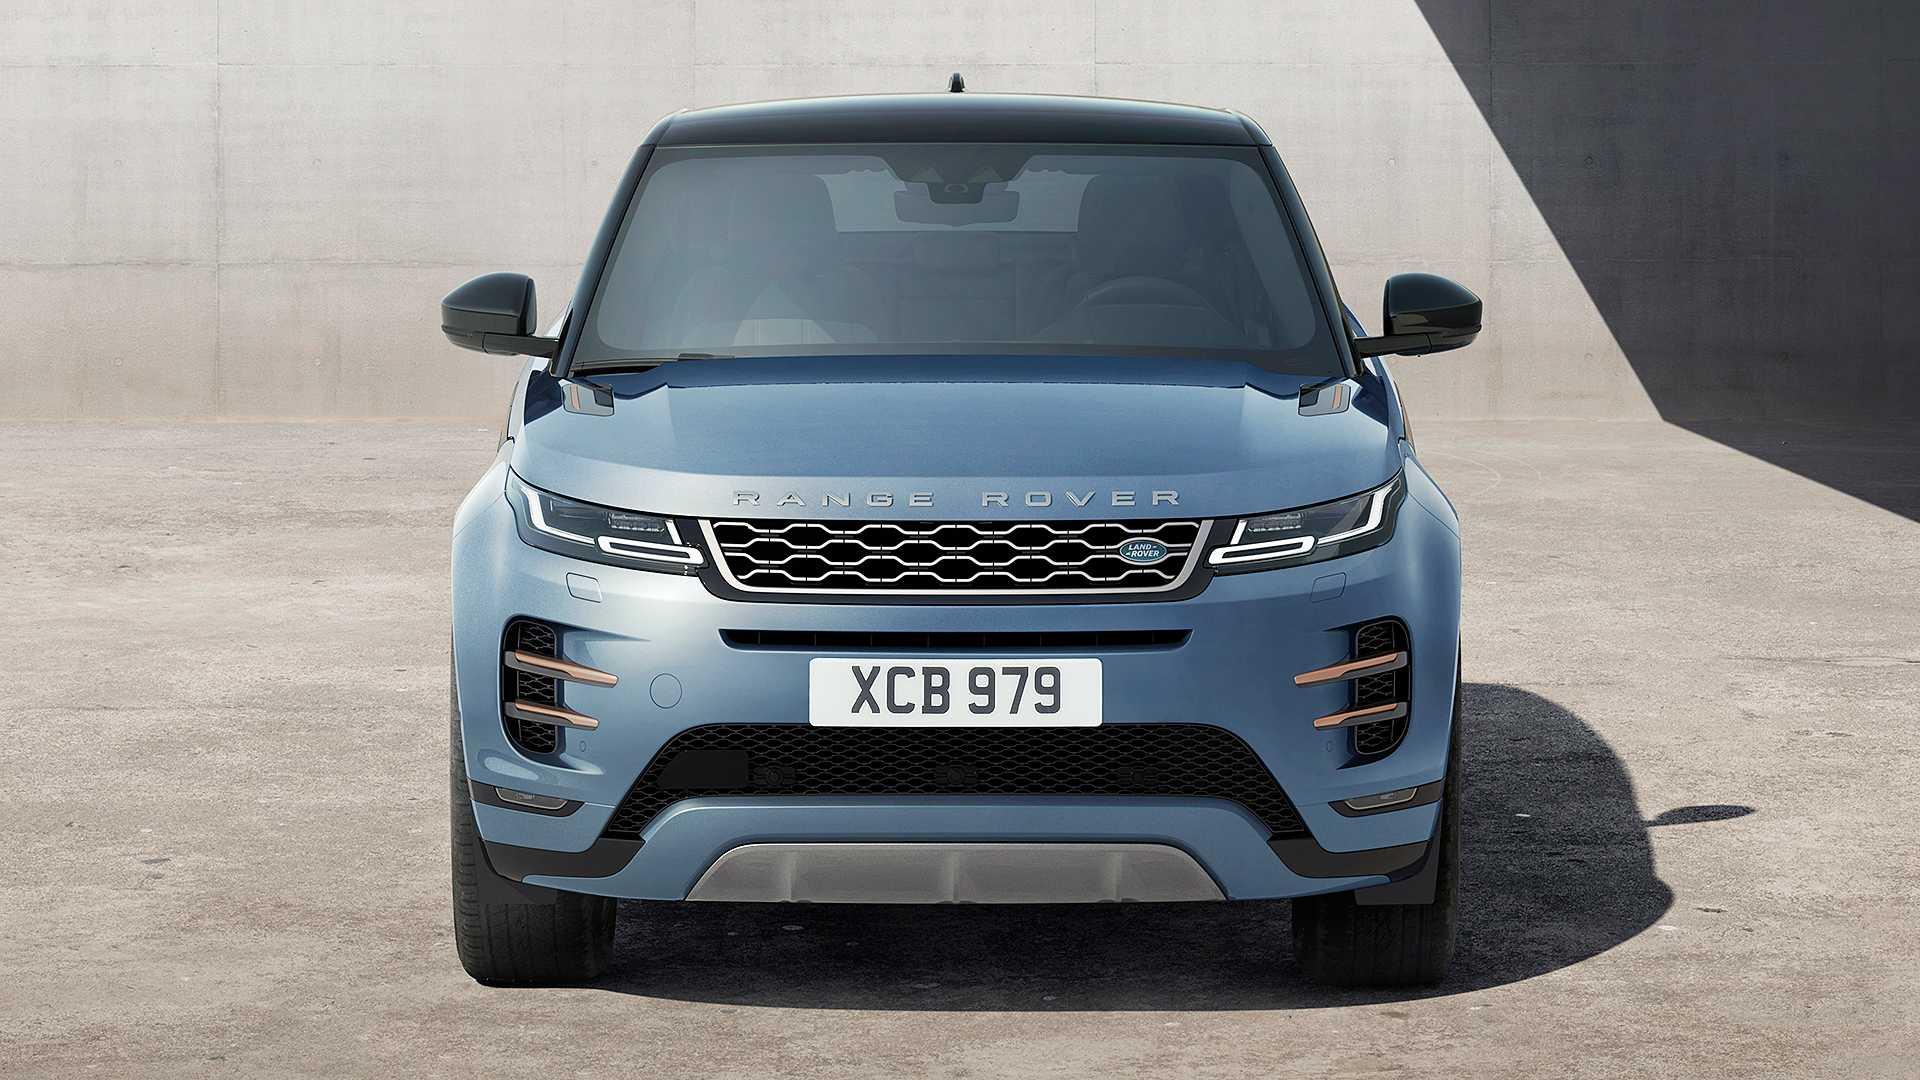 2020-range-rover-evoque (78)